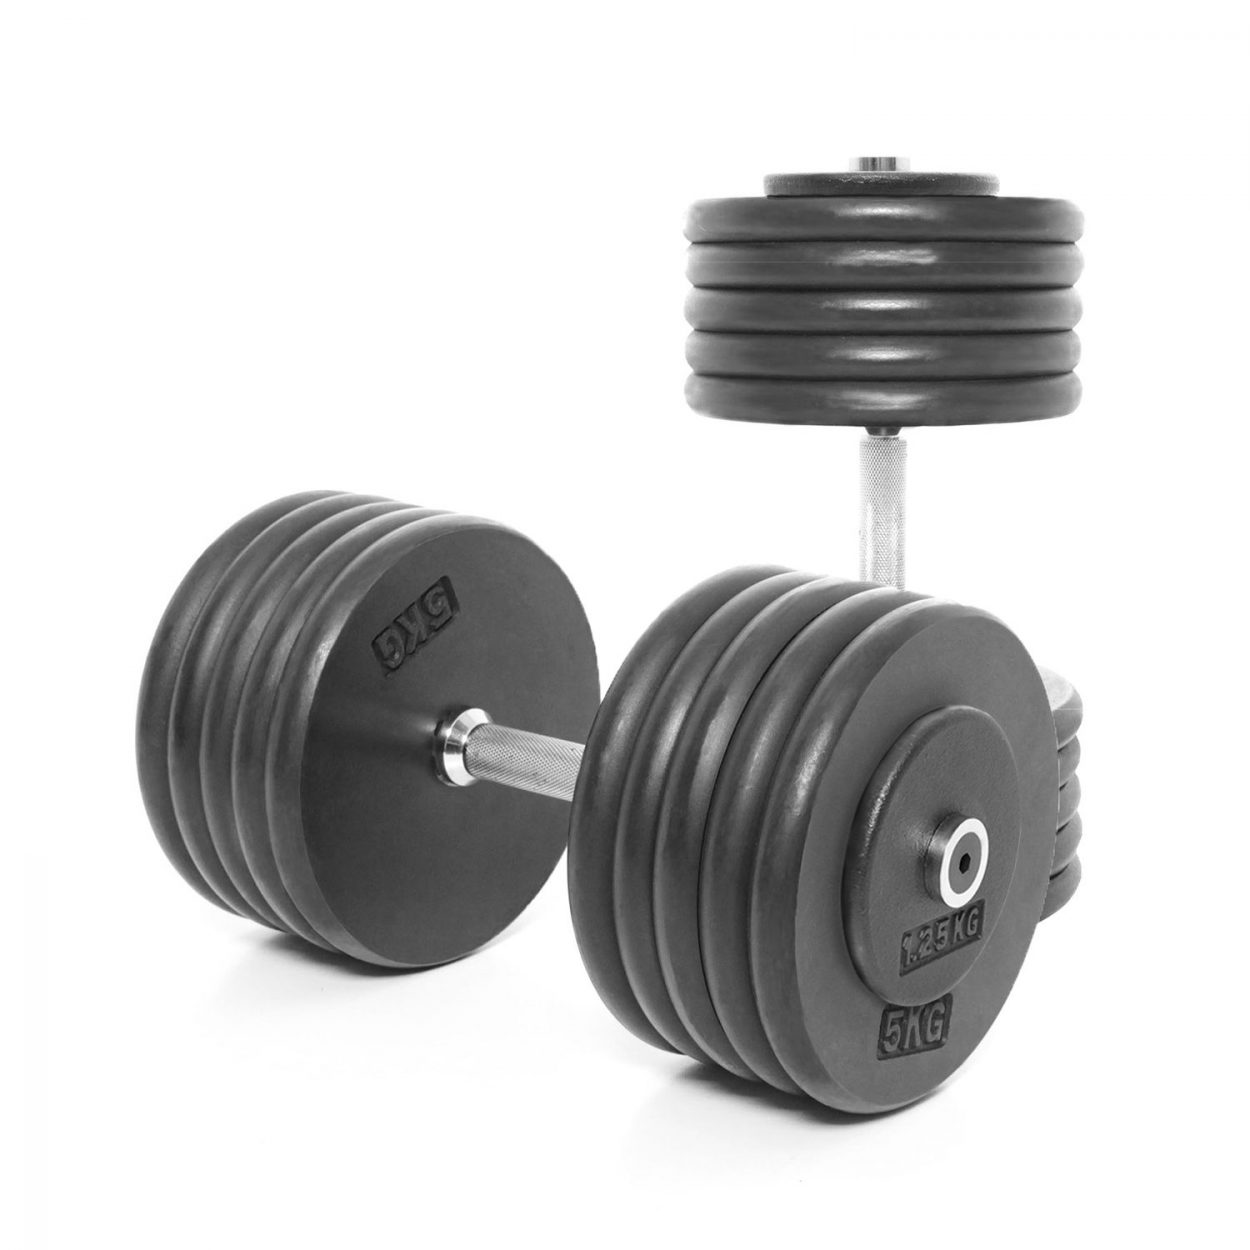 Body Power Pro-style Dumbbells 52.5kg (x2)